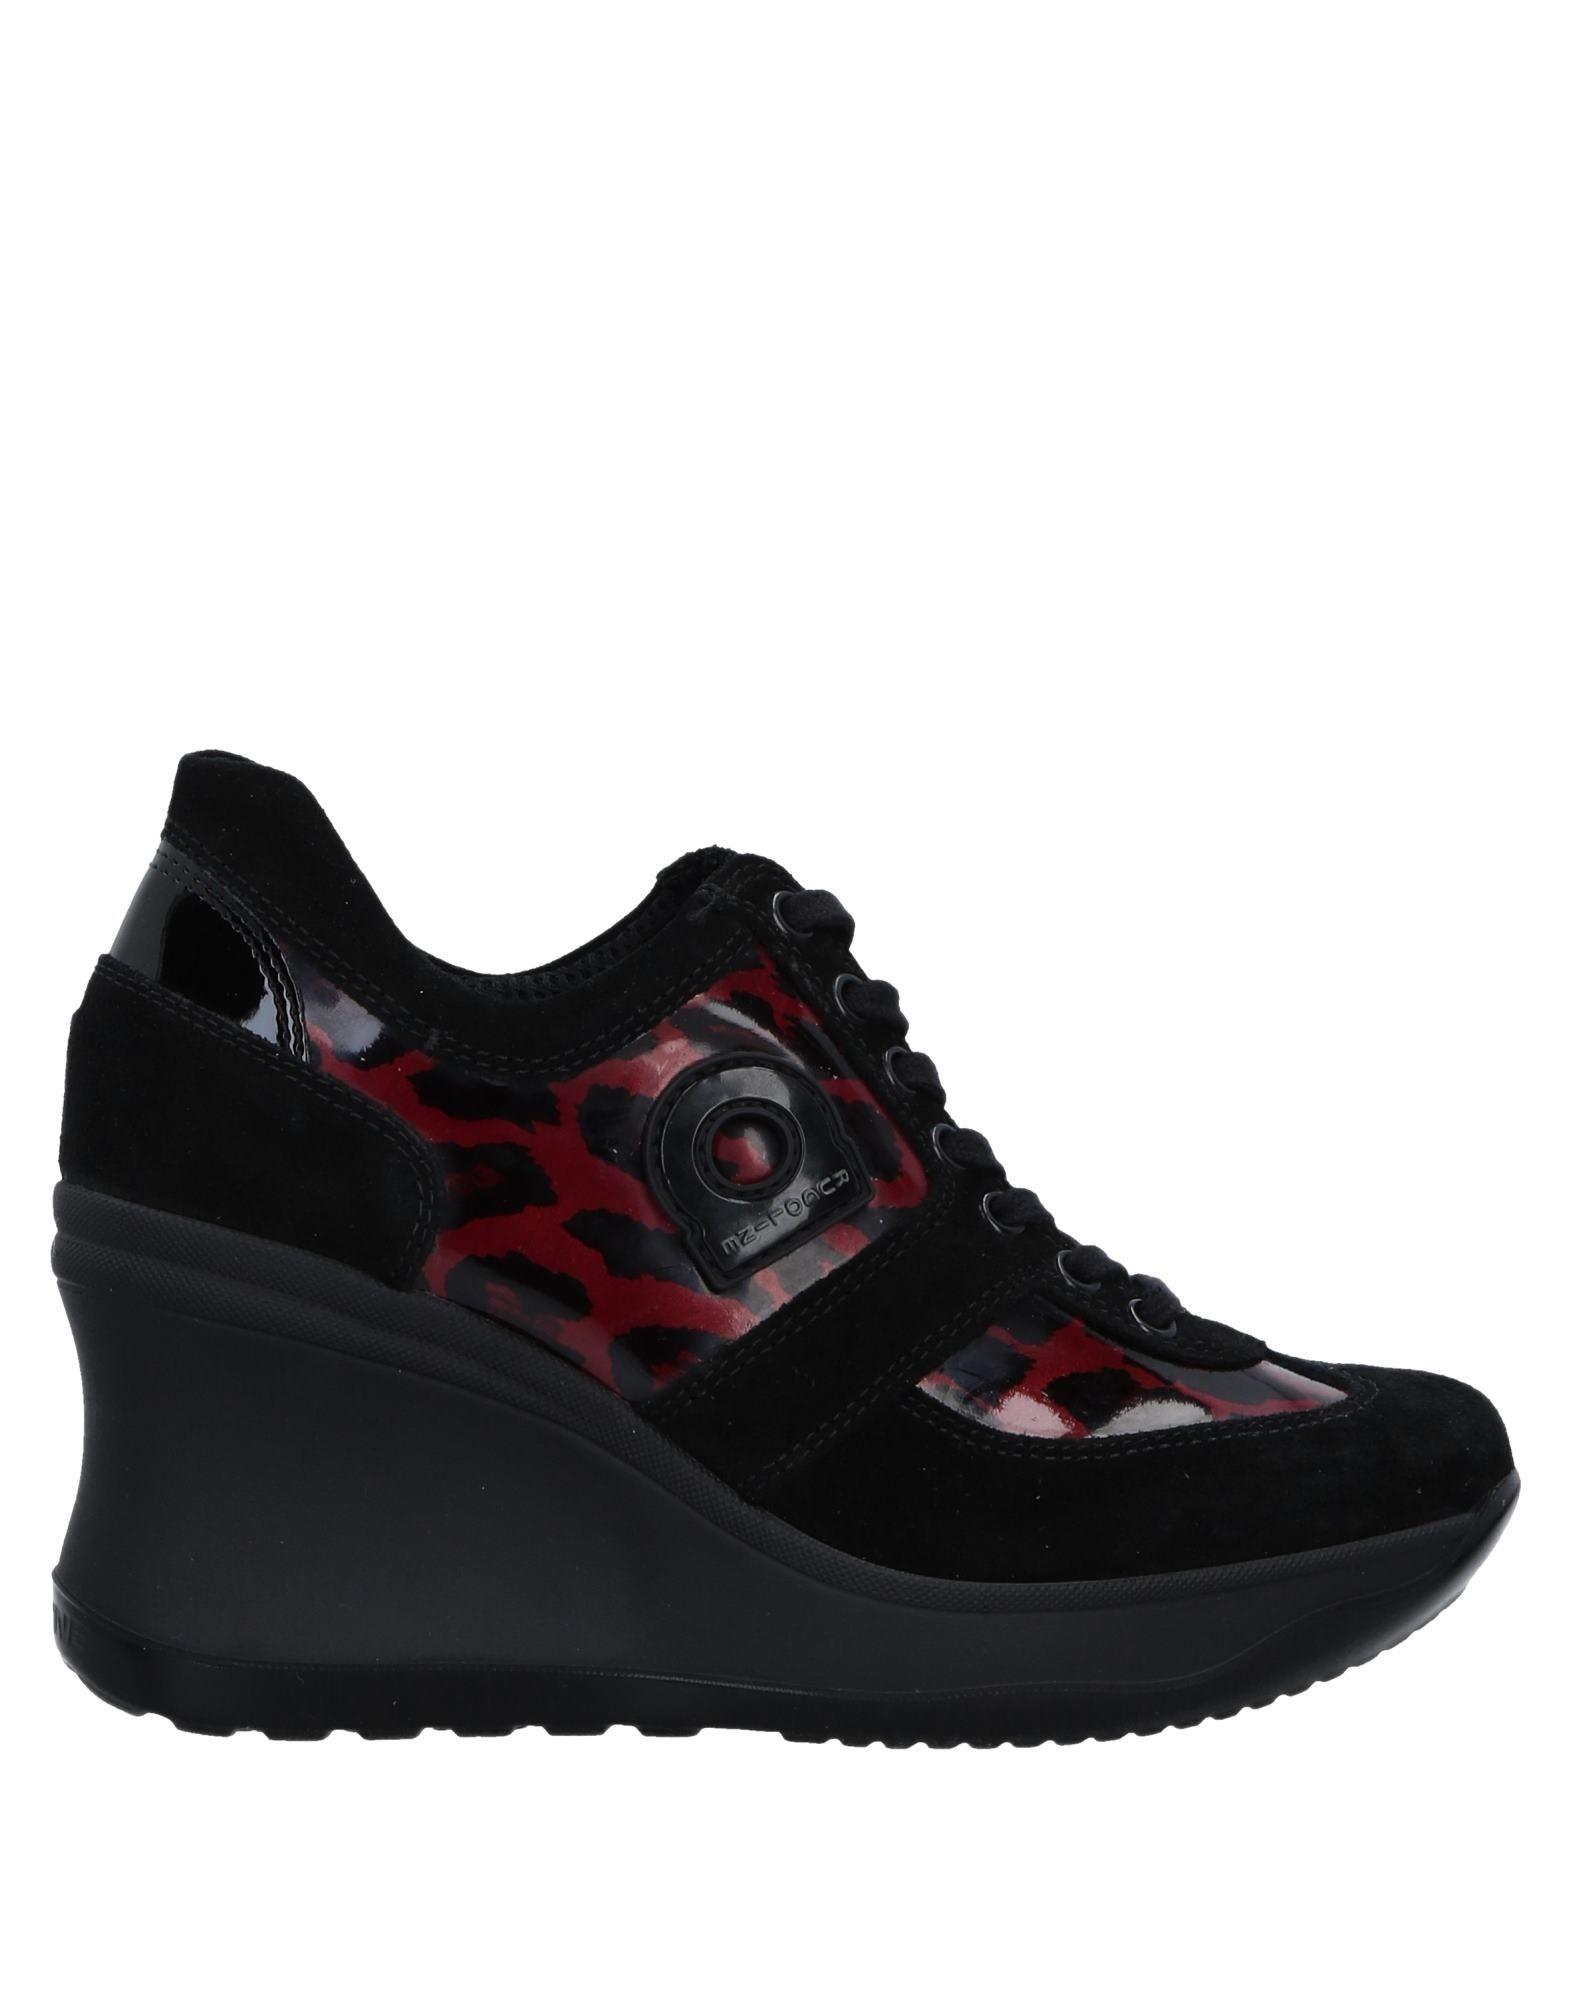 Agile By Rucoline Sneakers Damen  11498445LO Gute Qualität beliebte Schuhe